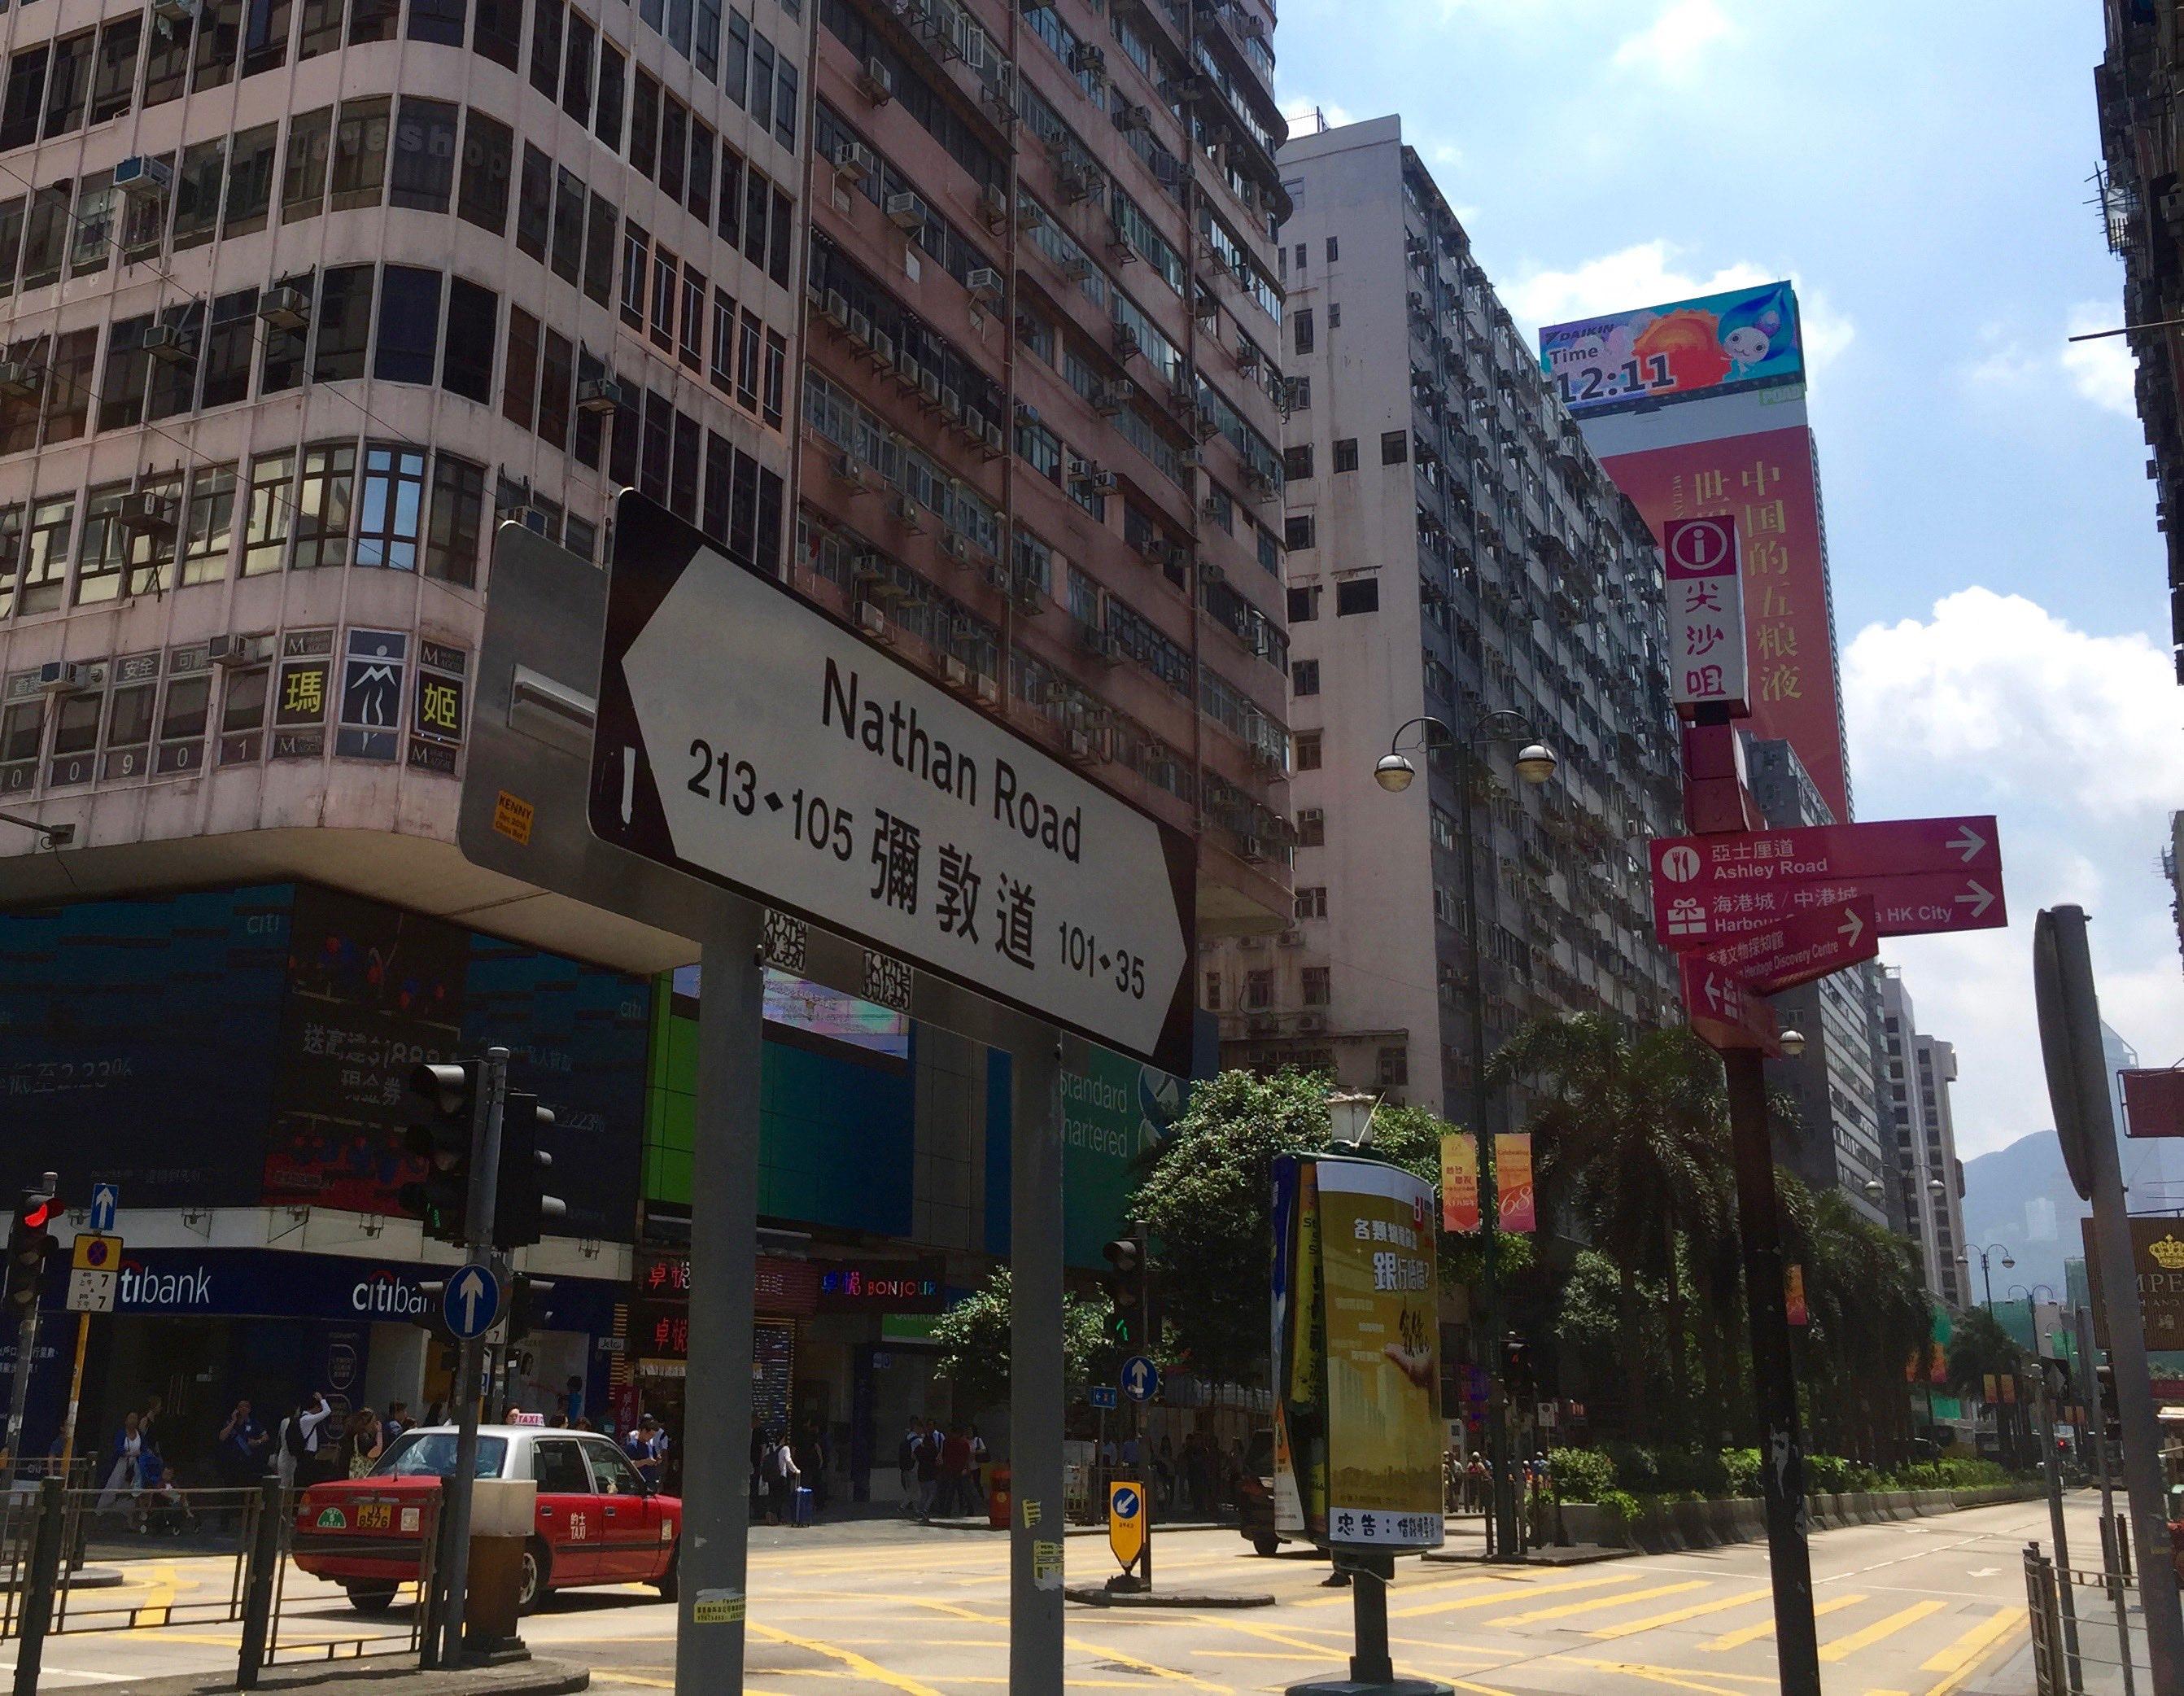 Hong Kong Nathan Road the highest traffic major road in Kowloon